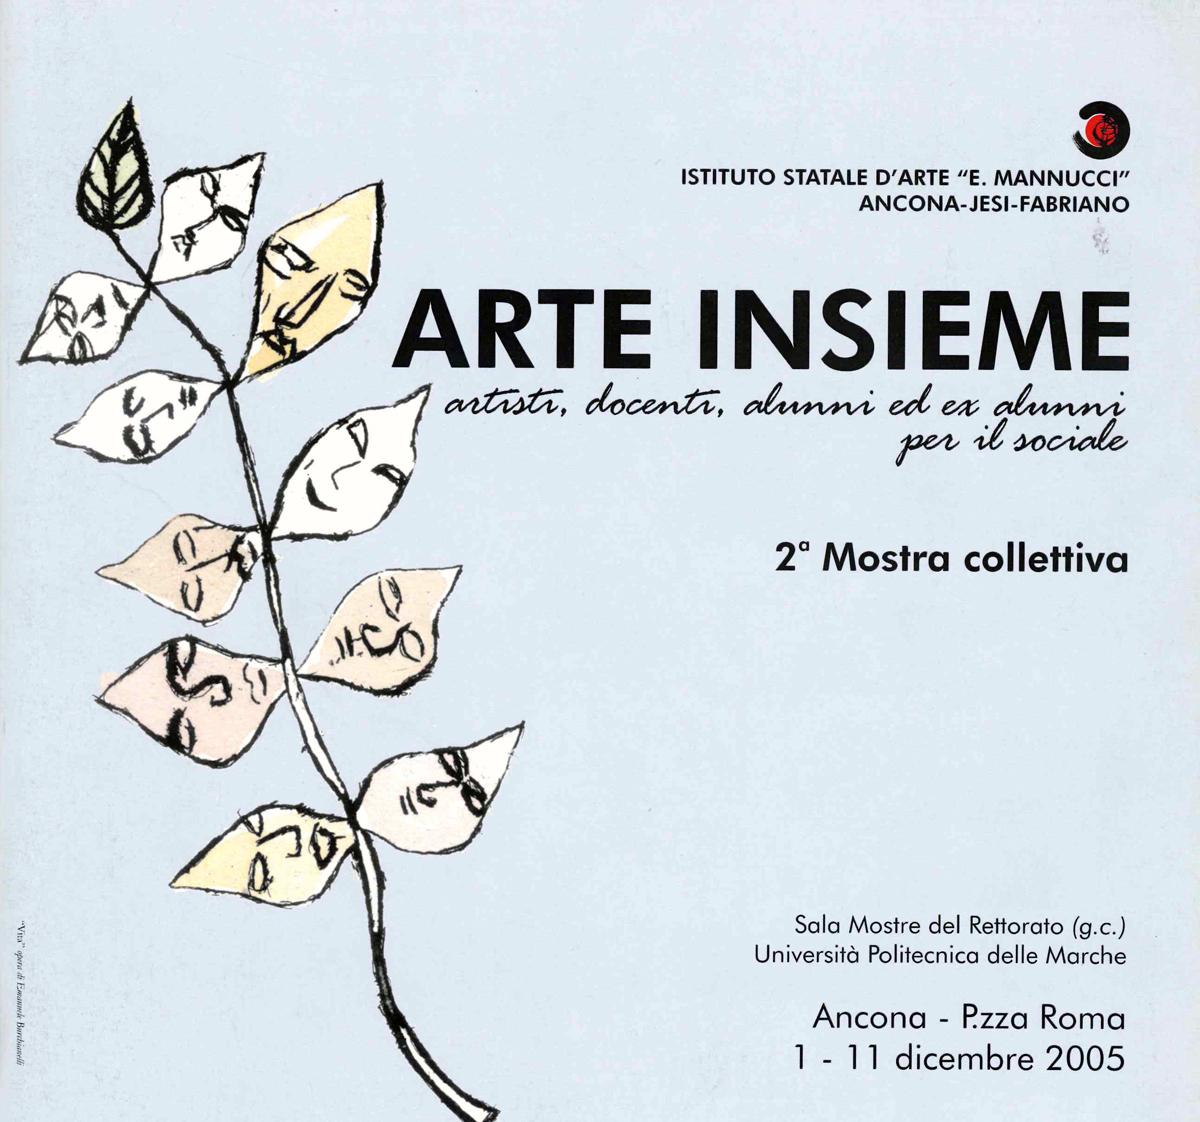 copertina catalogo arteinsime II edizione